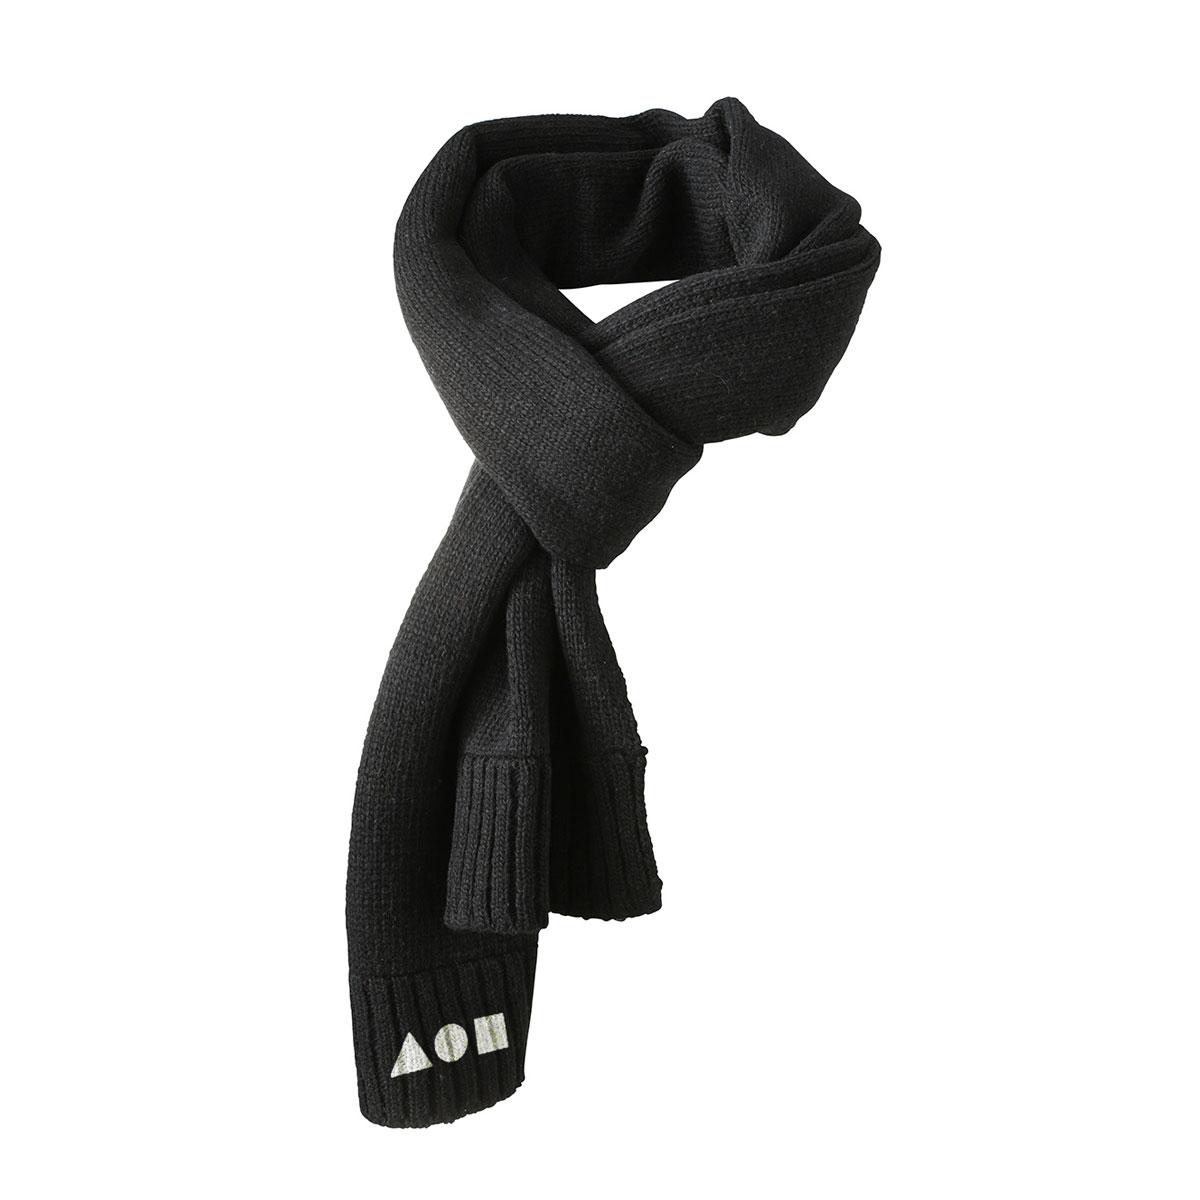 Sciarpa Pandemonio nera con logo bianco